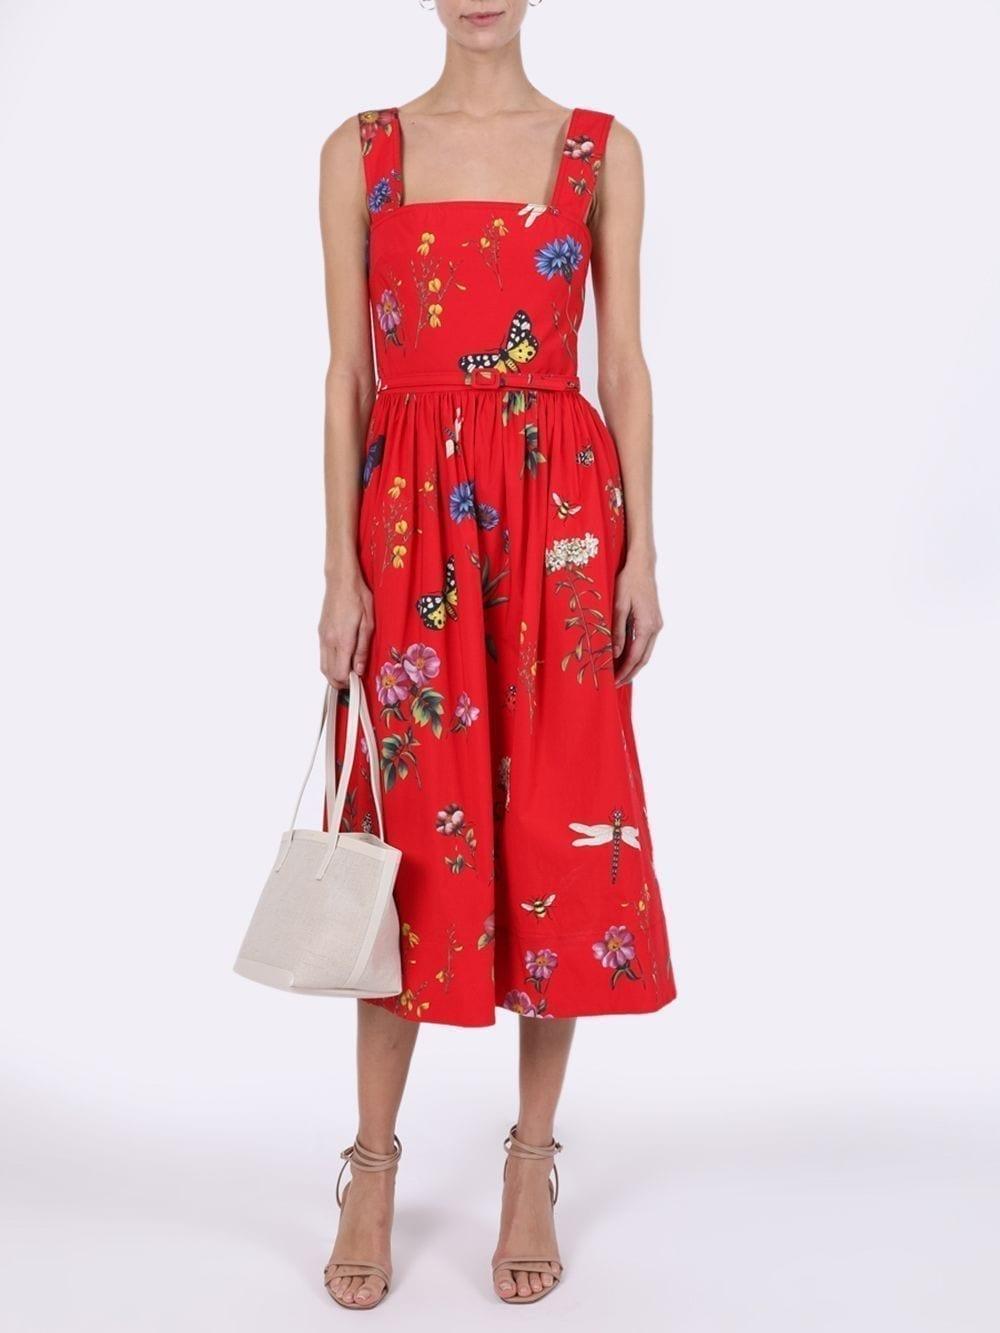 OSCAR DE LA RENTA Scarlet Red Printed Day Dress